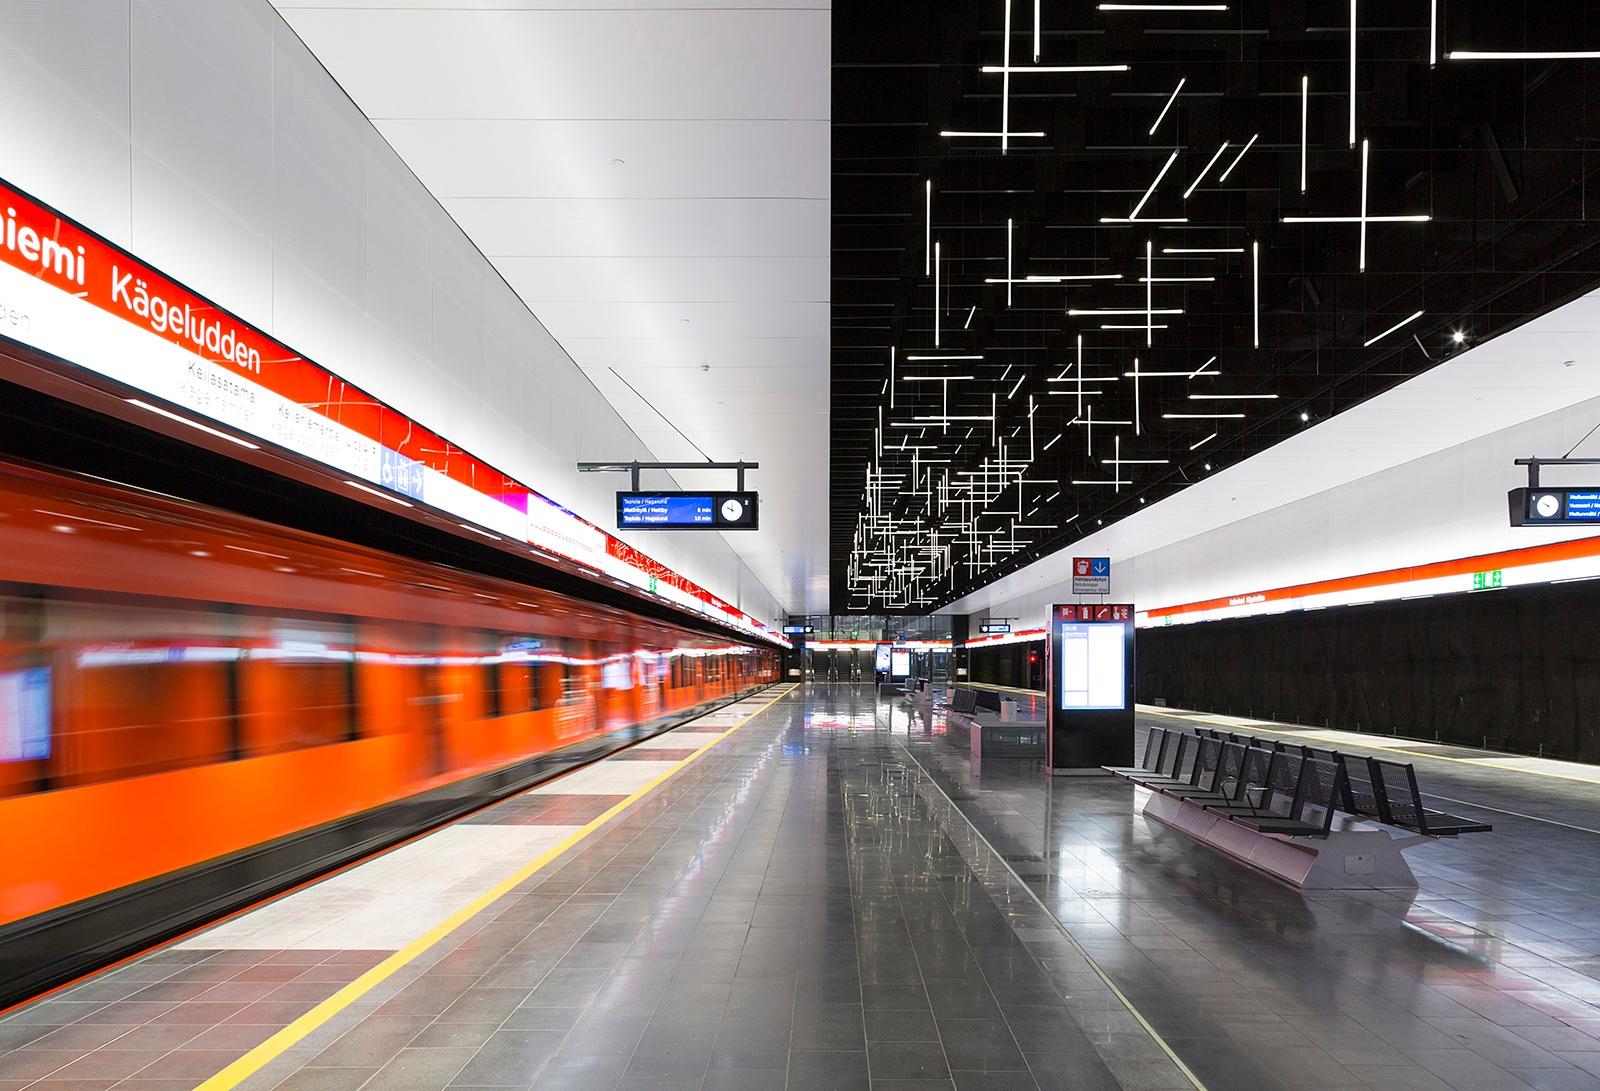 Helsinki+Metro+Station+Keilaniemi+by+Petri+Vuorio_1600